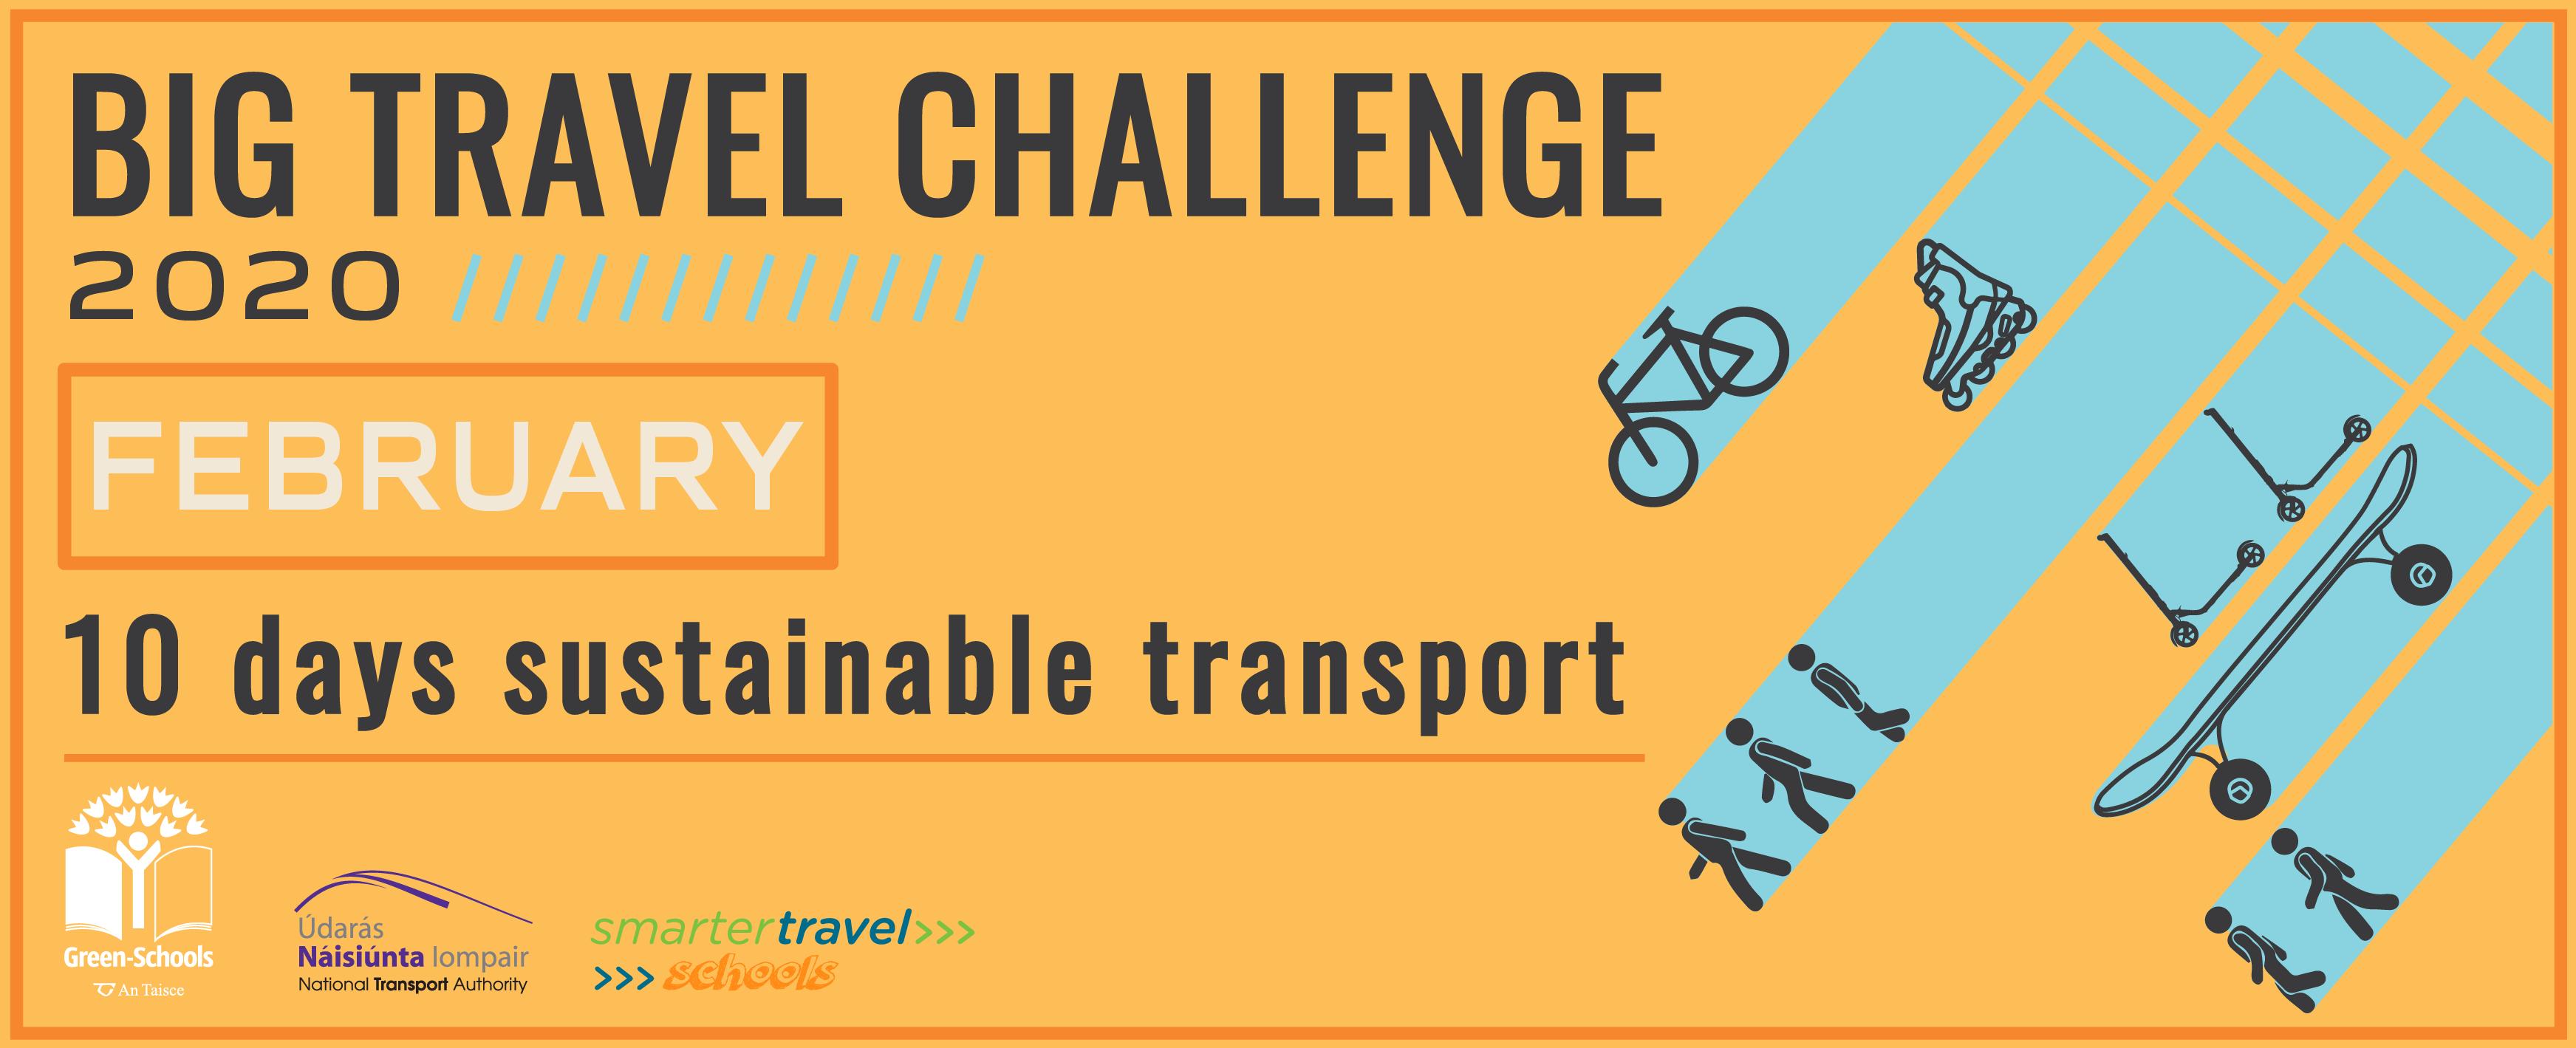 Big Travel Challenge